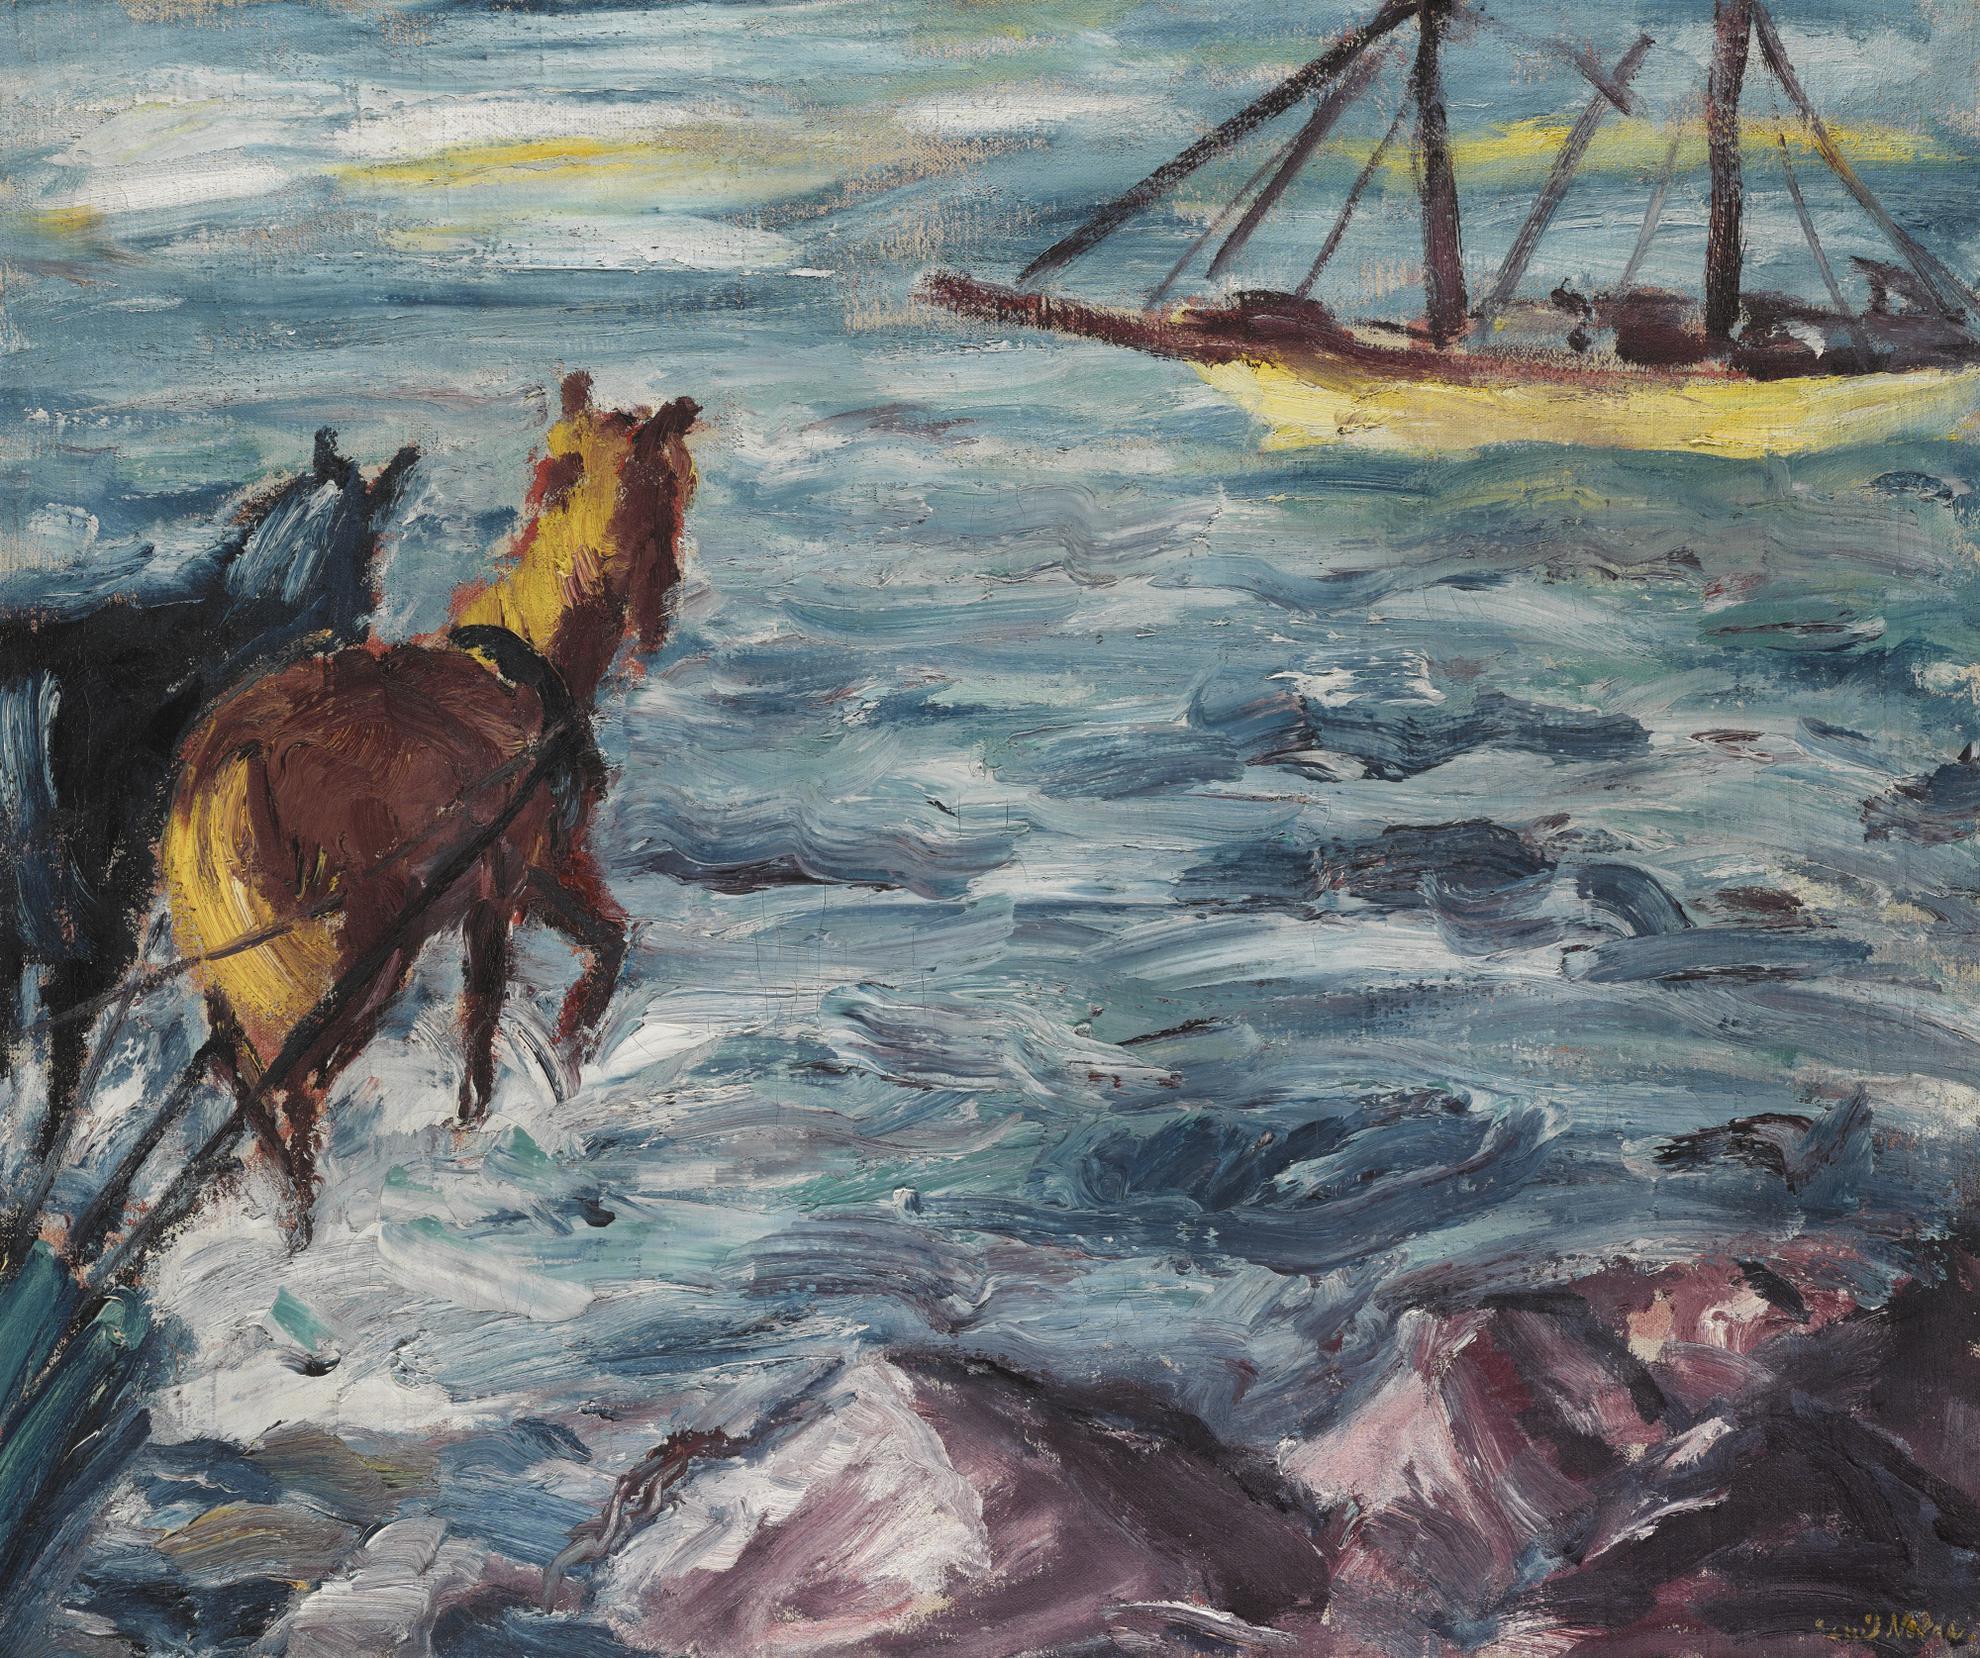 Emil Nolde-Einschiffung (Embarkation)-1911